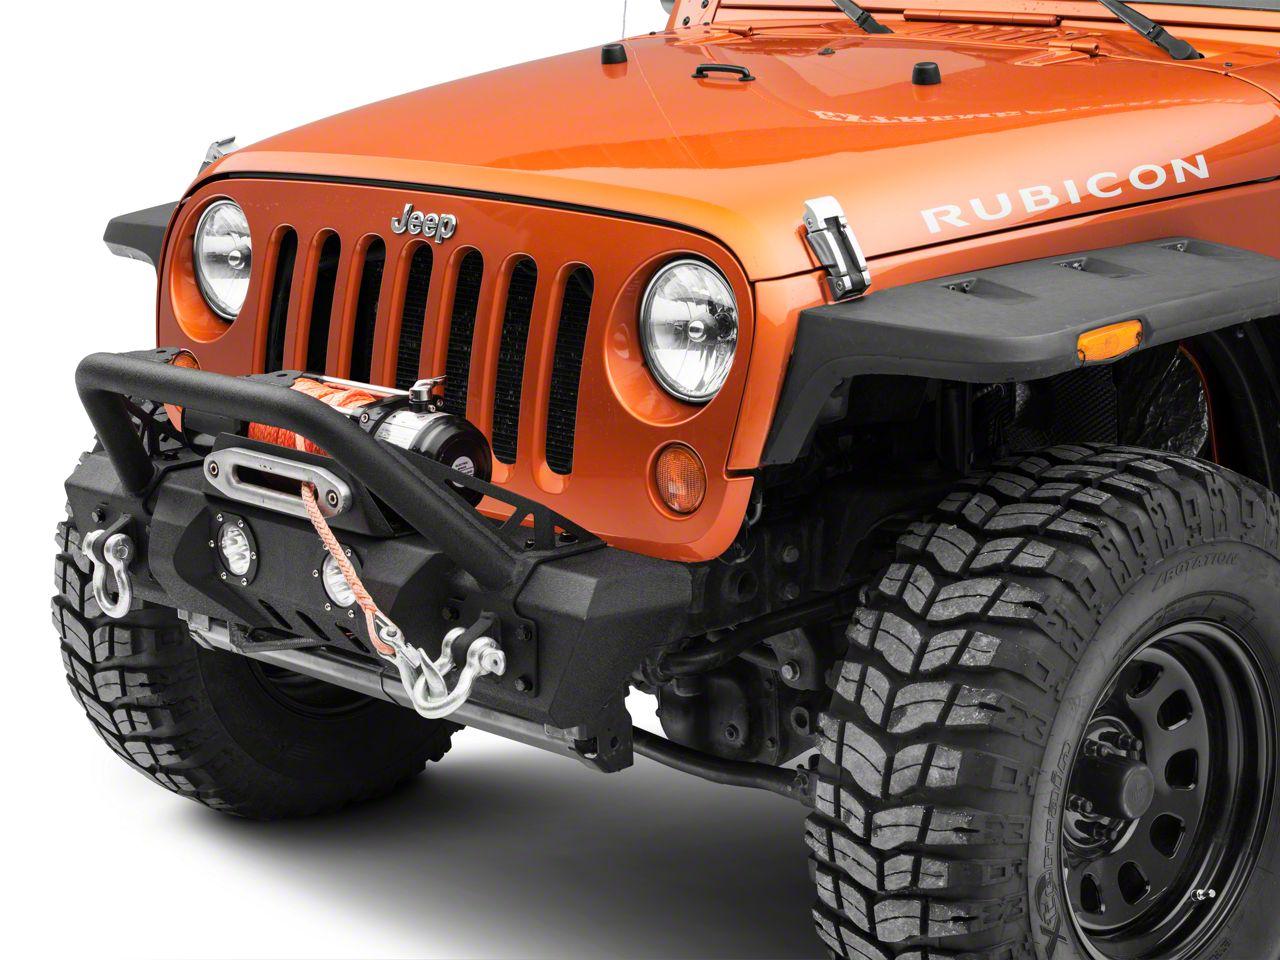 RedRock 4x4 Stubby Front Bumper w/ LED Fog Lights, Winch Mount & Over-Rider (07-18 Jeep Wrangler JK)